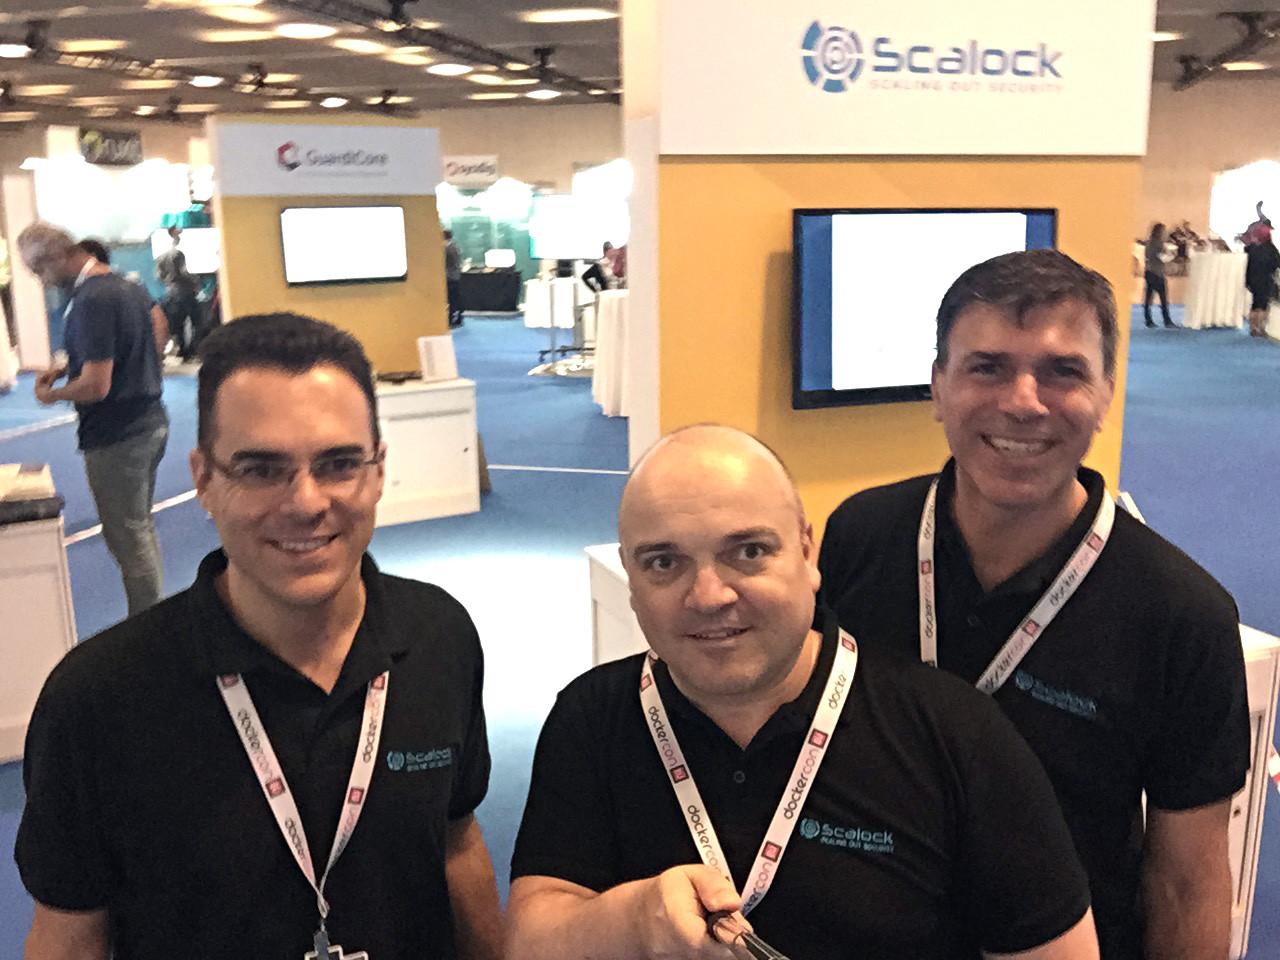 Dockercon_Barca2015.jpg